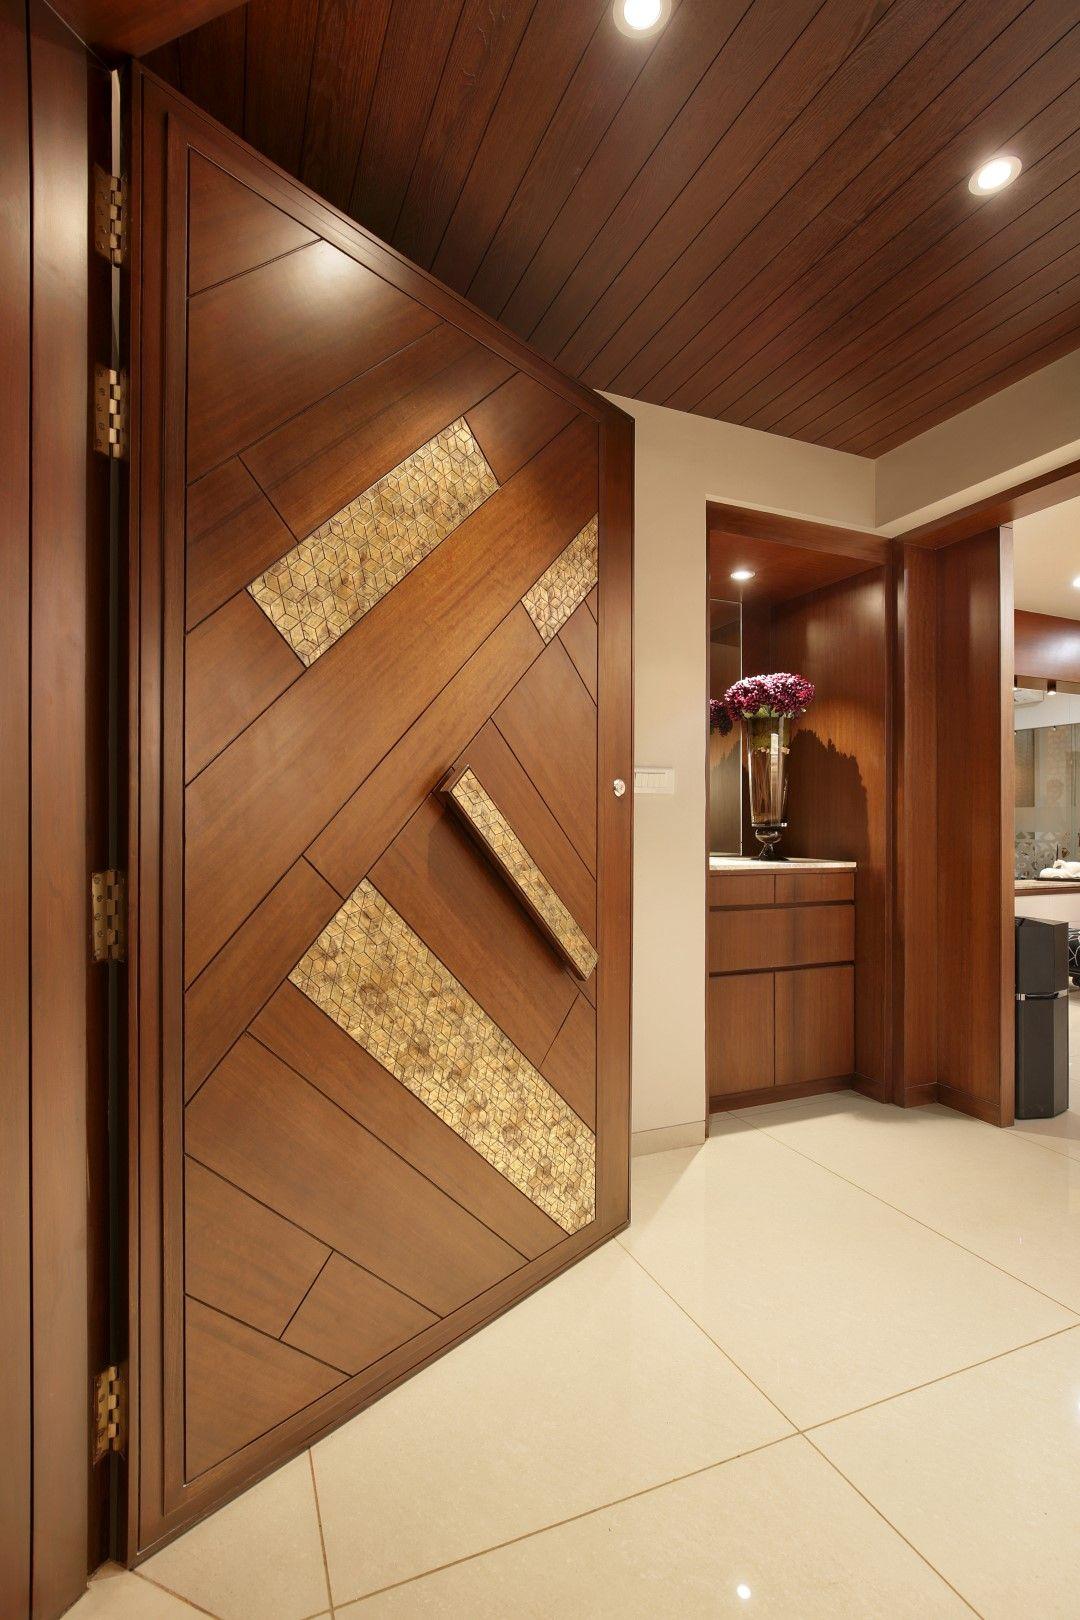 3 BHK Flat Interiors - The Oak Woods | Vadodara | Studio7 ...